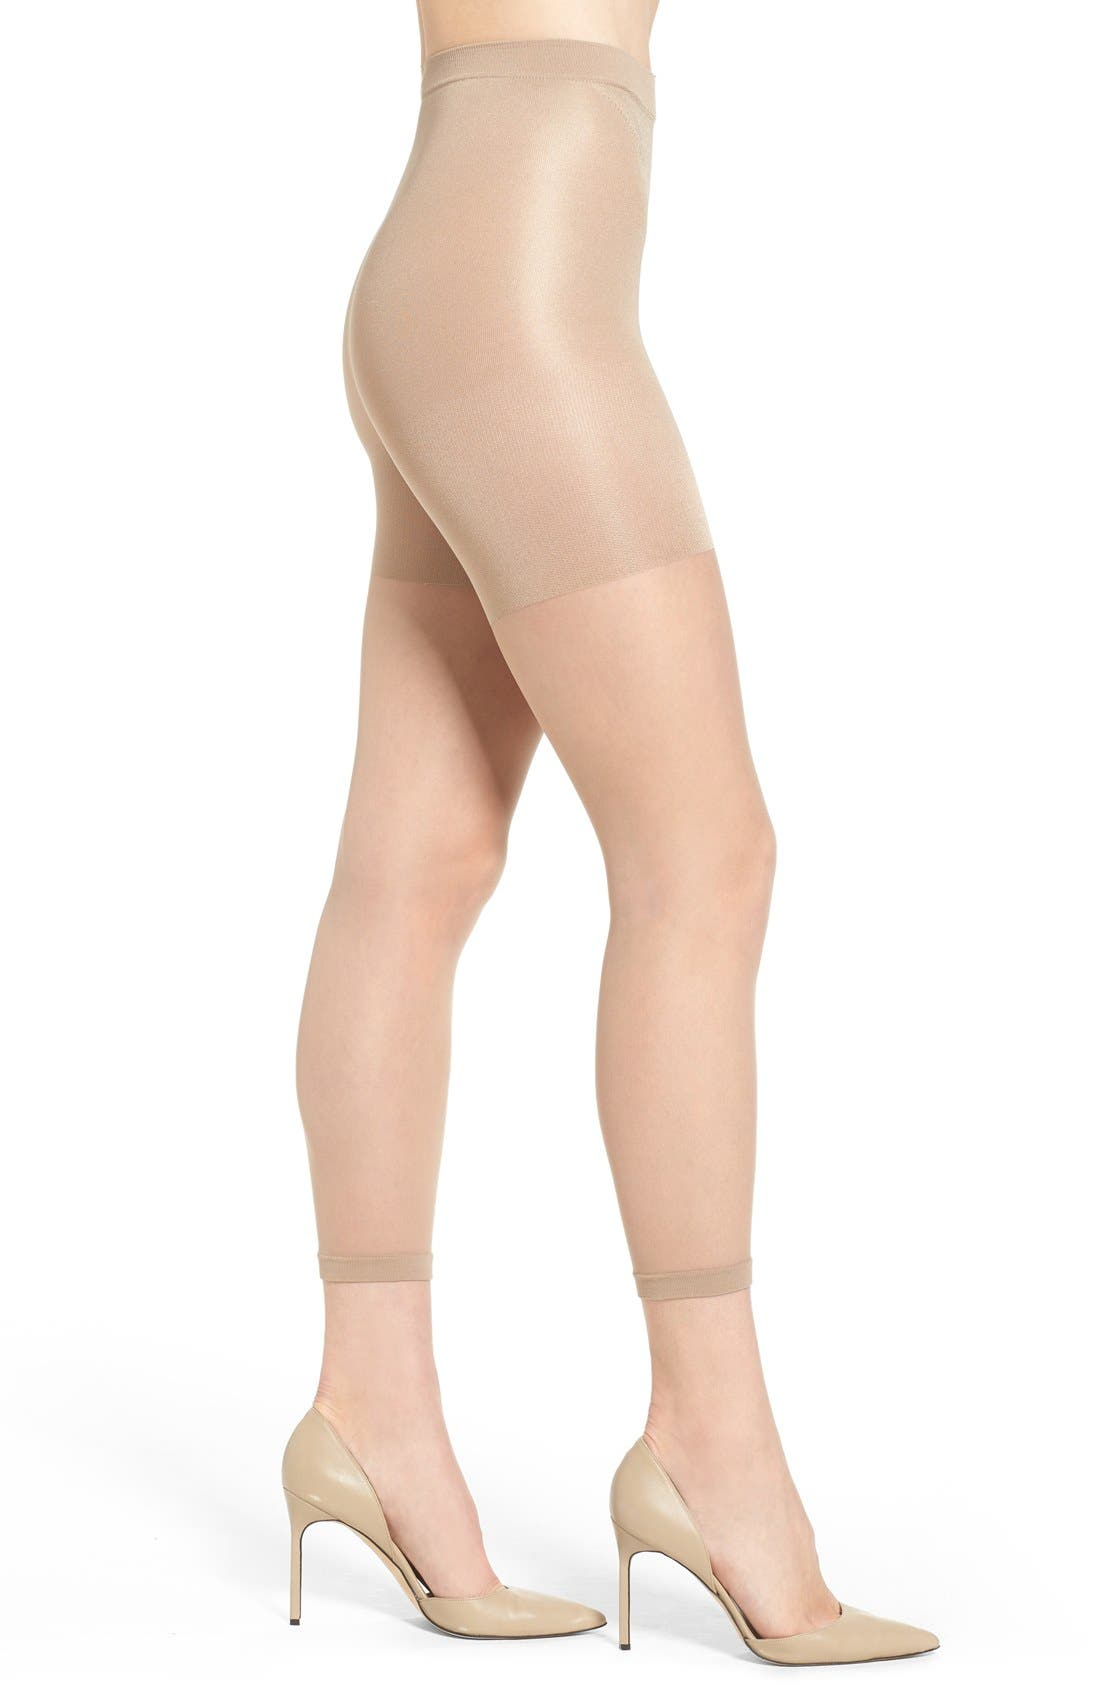 Power Capri Control Top Footless Pantyhose,                             Main thumbnail 1, color,                             NUDE